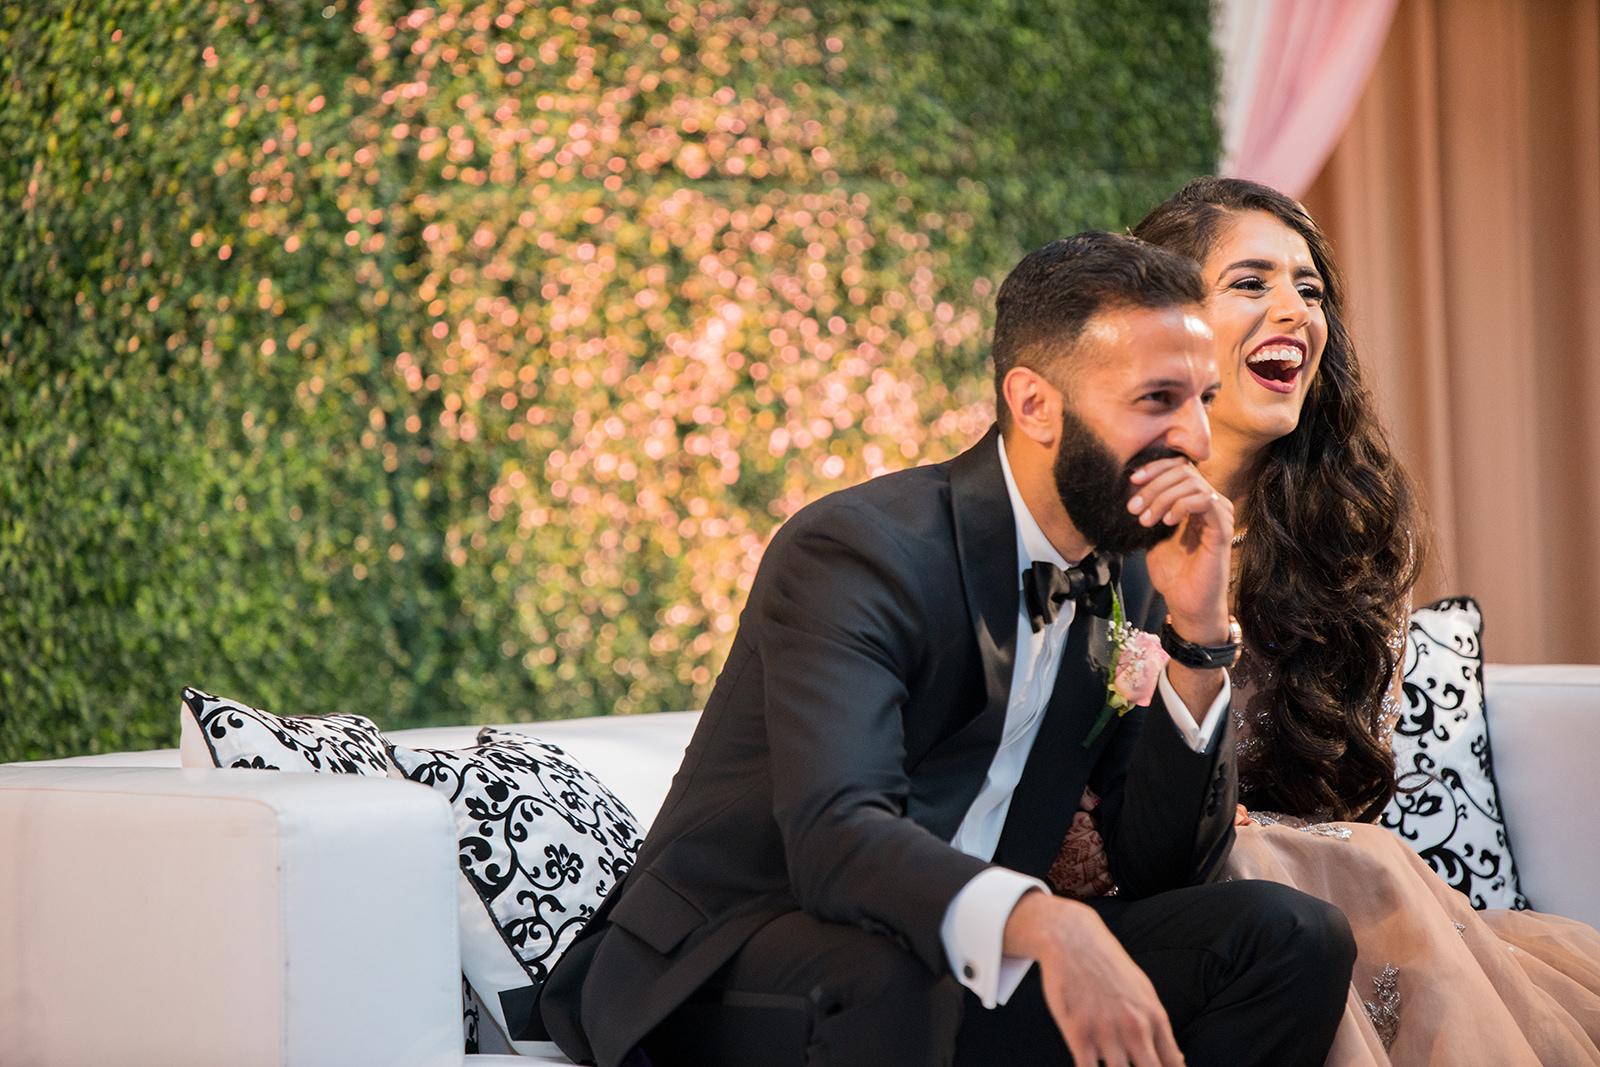 Le Cape Weddings - Sumeet and Chavi - Reception   -47.jpg